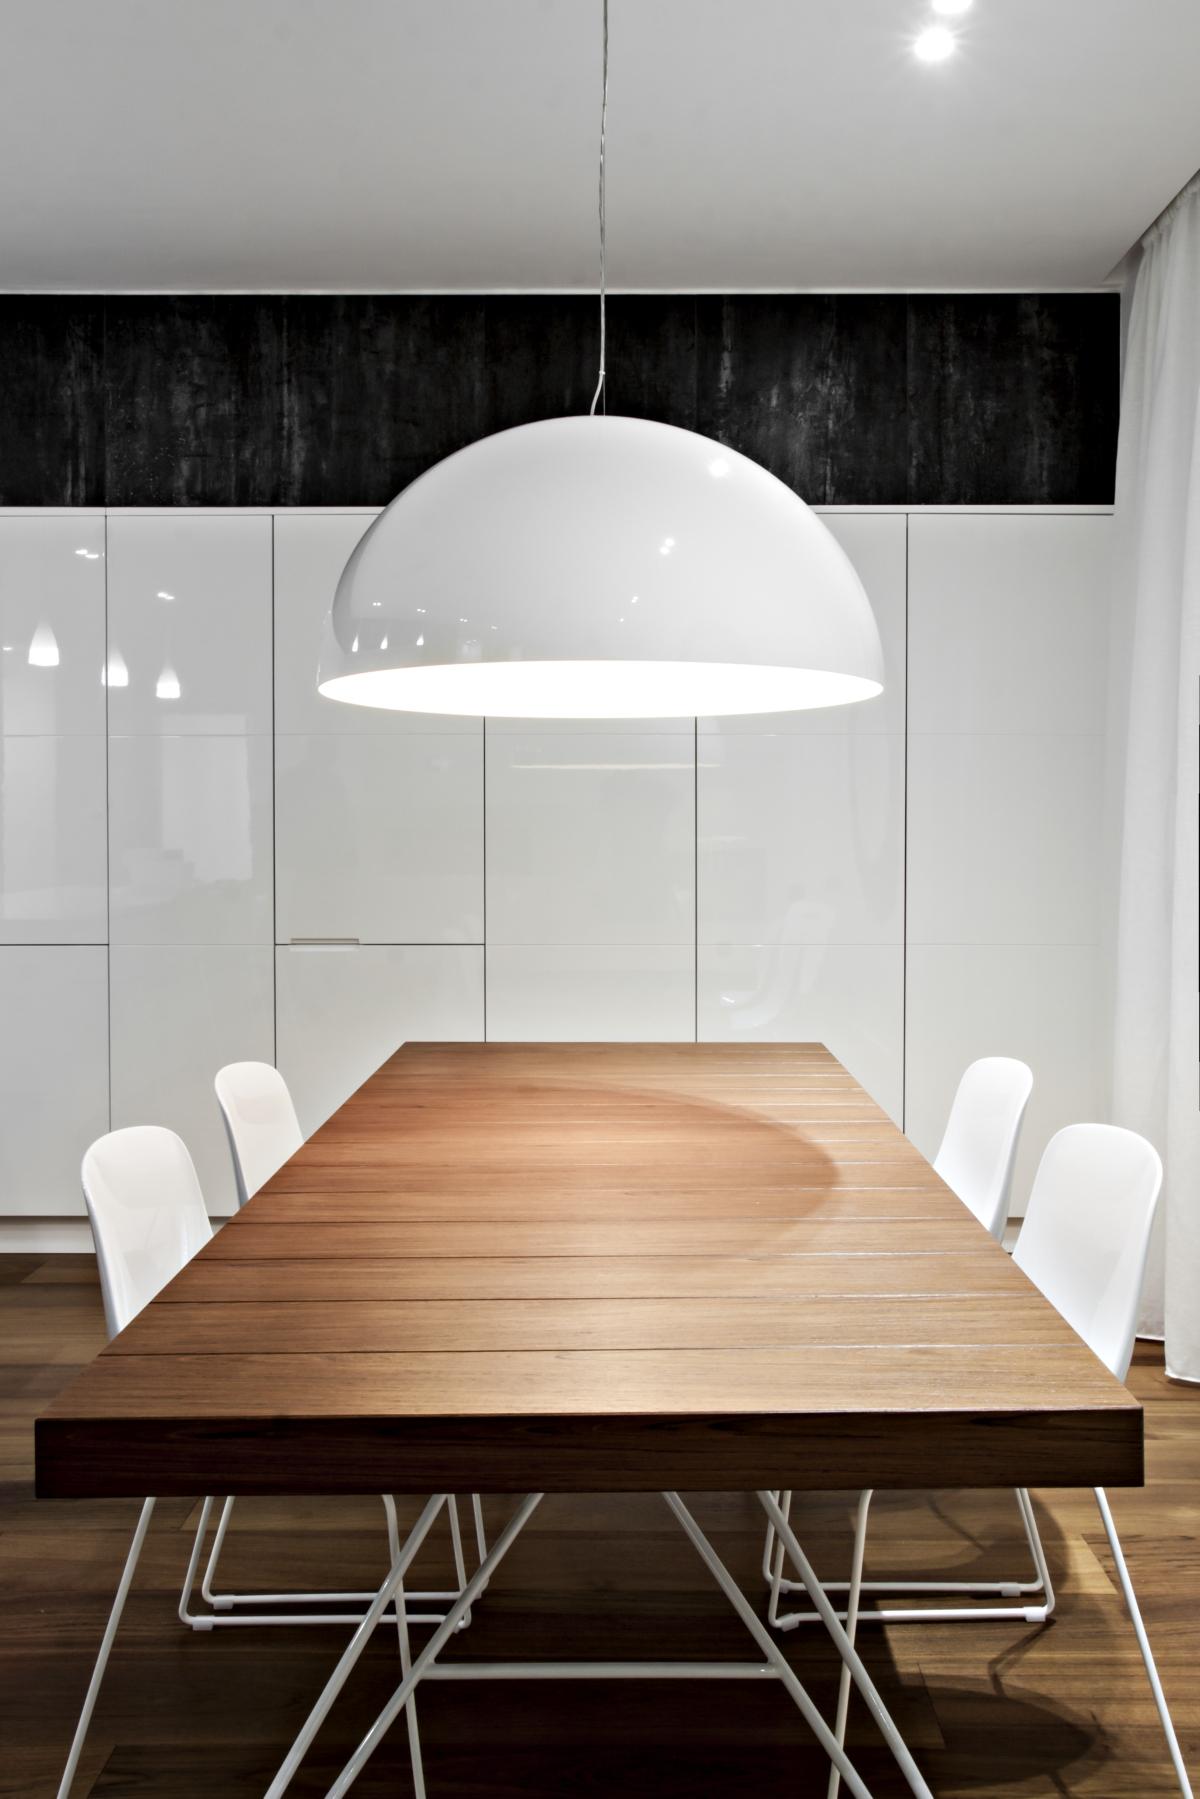 sg-Haus-michelangelo-Olivieri-for-m12ad-23